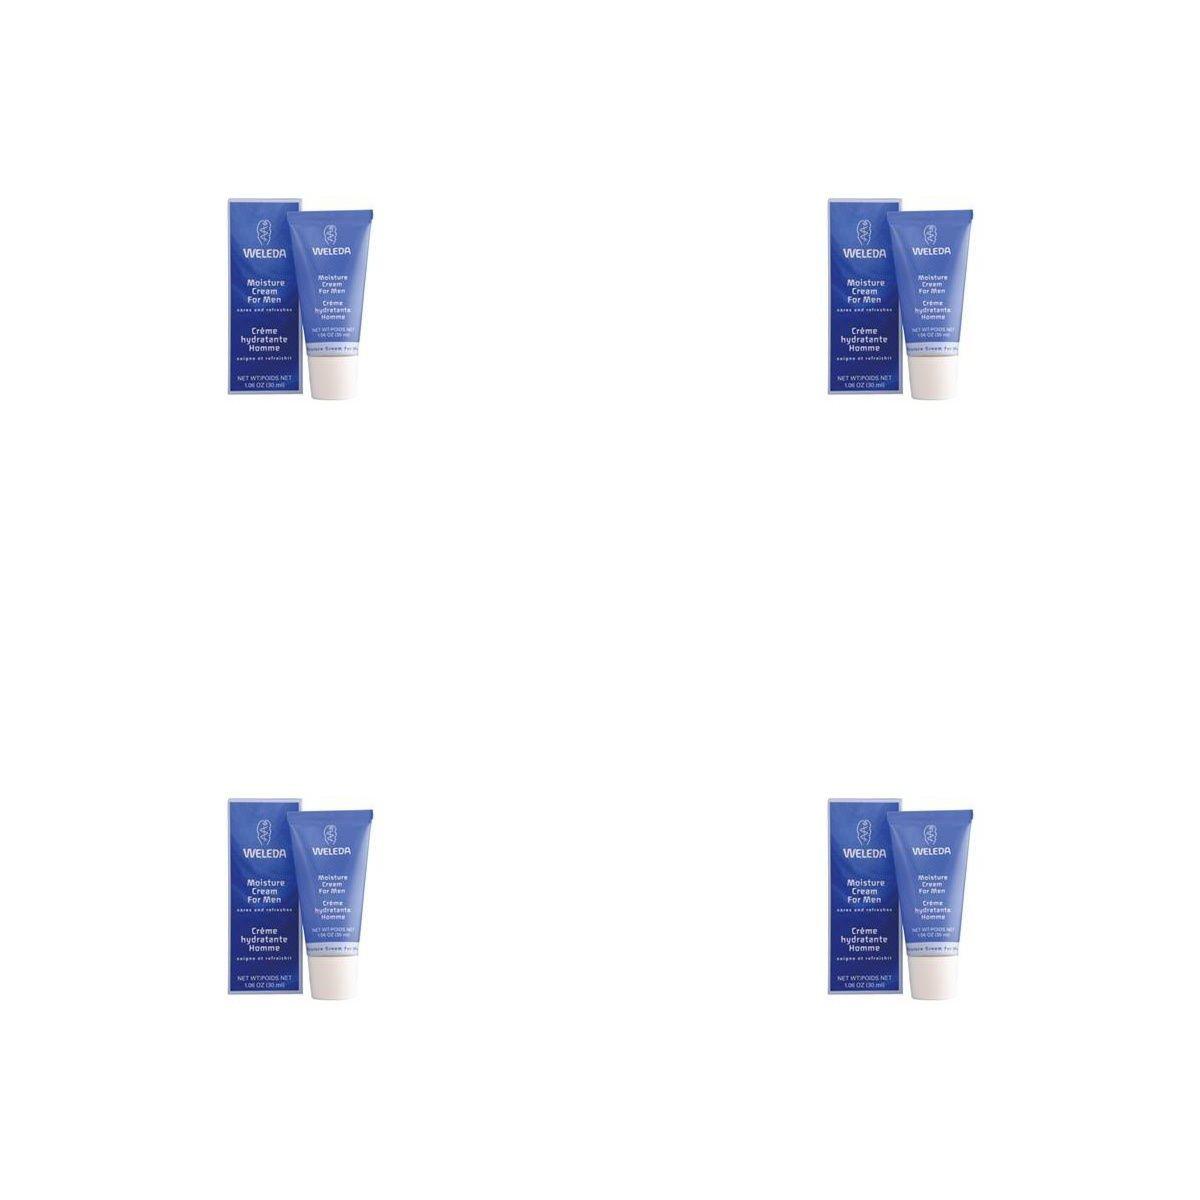 (4 PACK) - Weleda Moisture Cream For Men   30ml   4 PACK - SUPER SAVER - SAVE MONEY